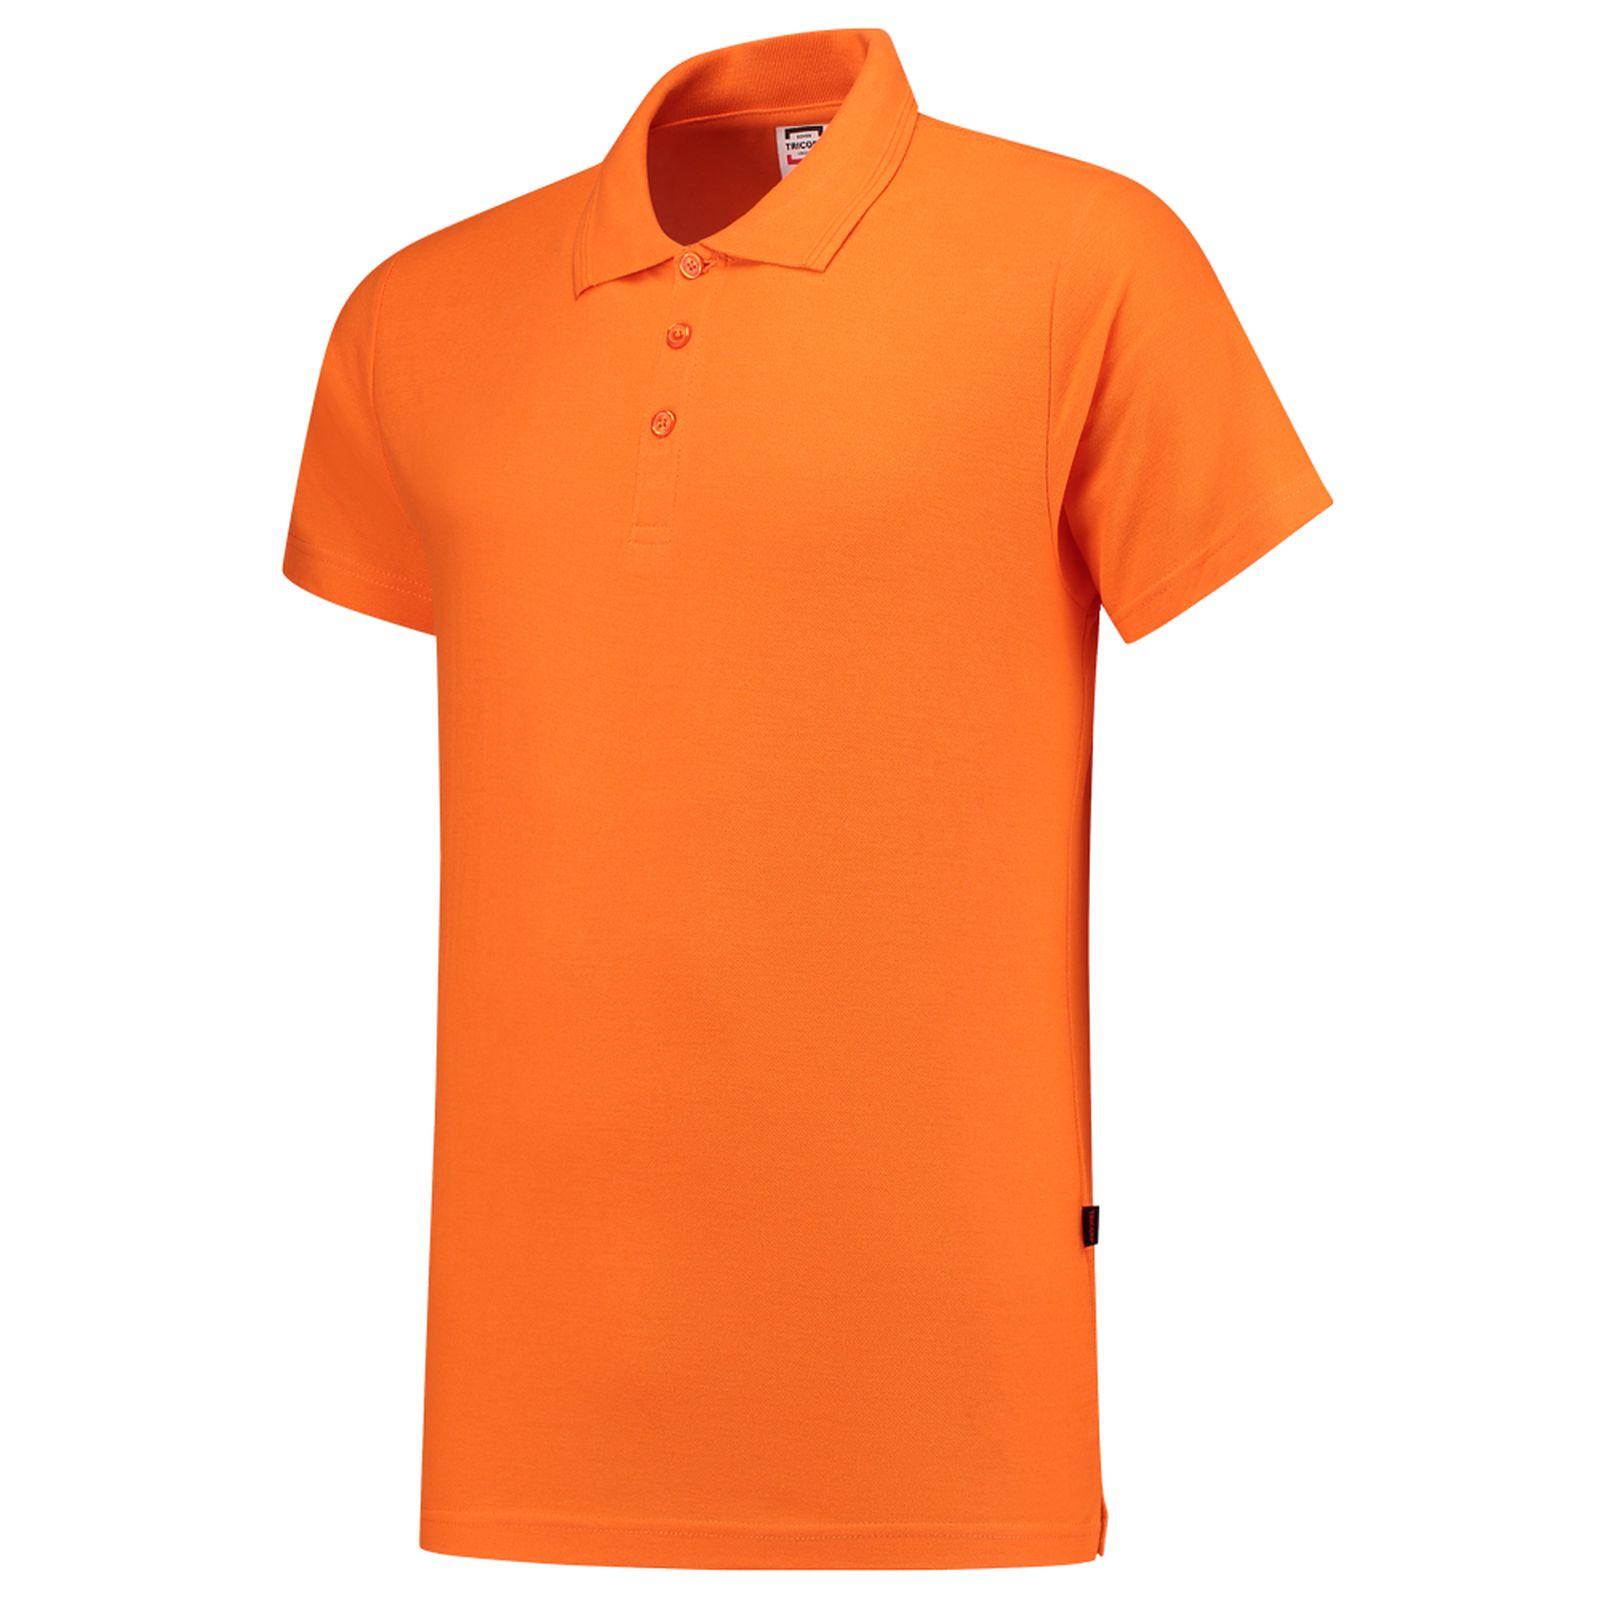 Tricorp Casual Poloshirts 201005-PPF180 oranje(Orange)